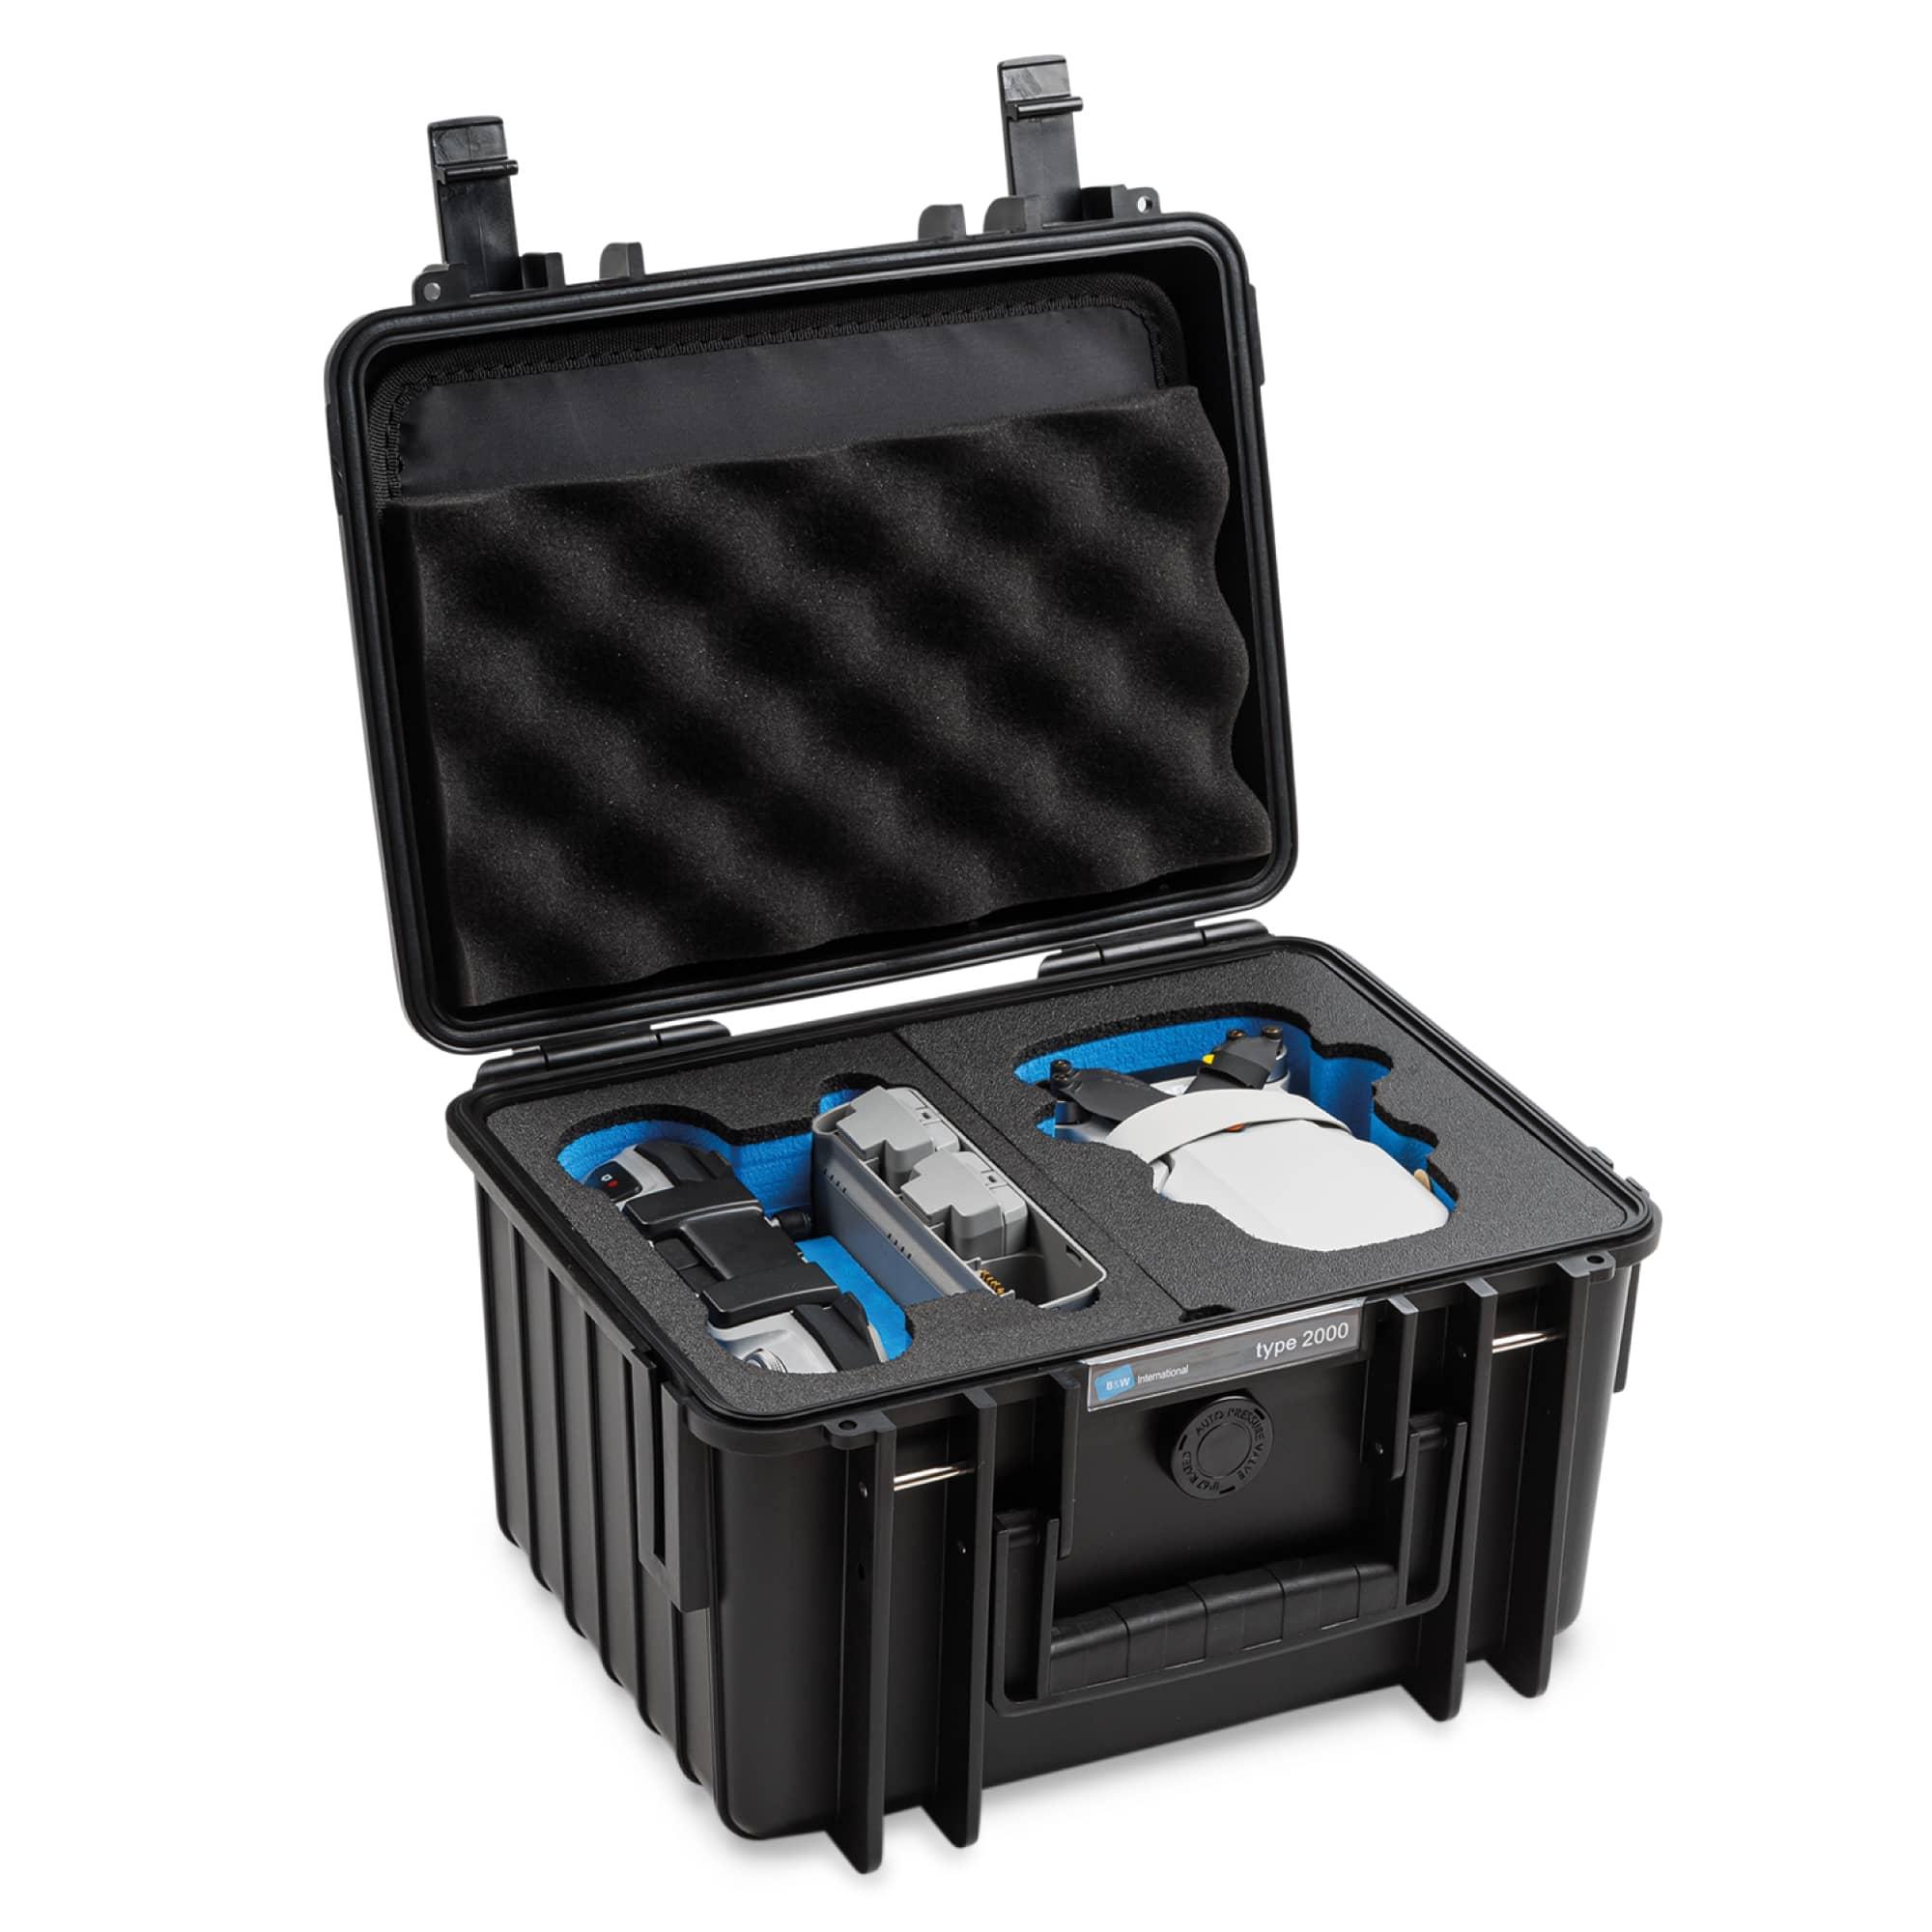 B&W Special Case Typ 2000 with 3D foam for DJI Mini 2